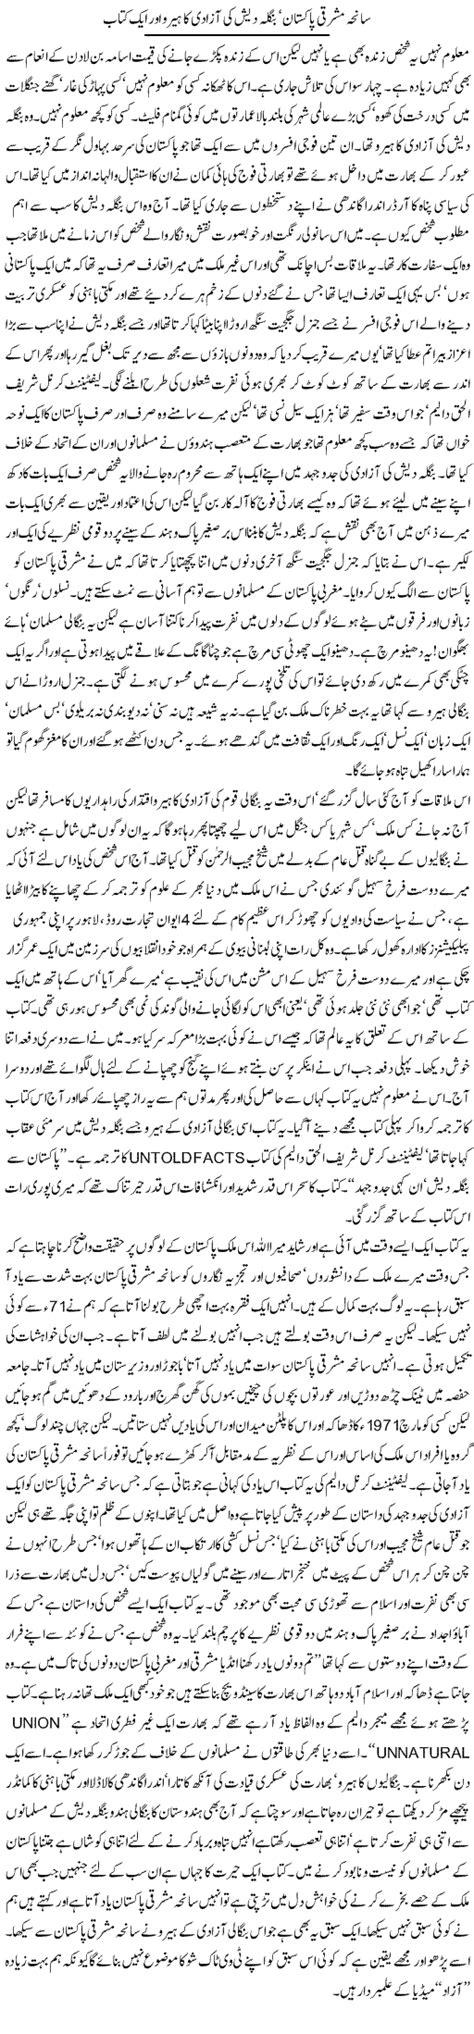 anti teacher or mosi ki chut stories gandi picture 5